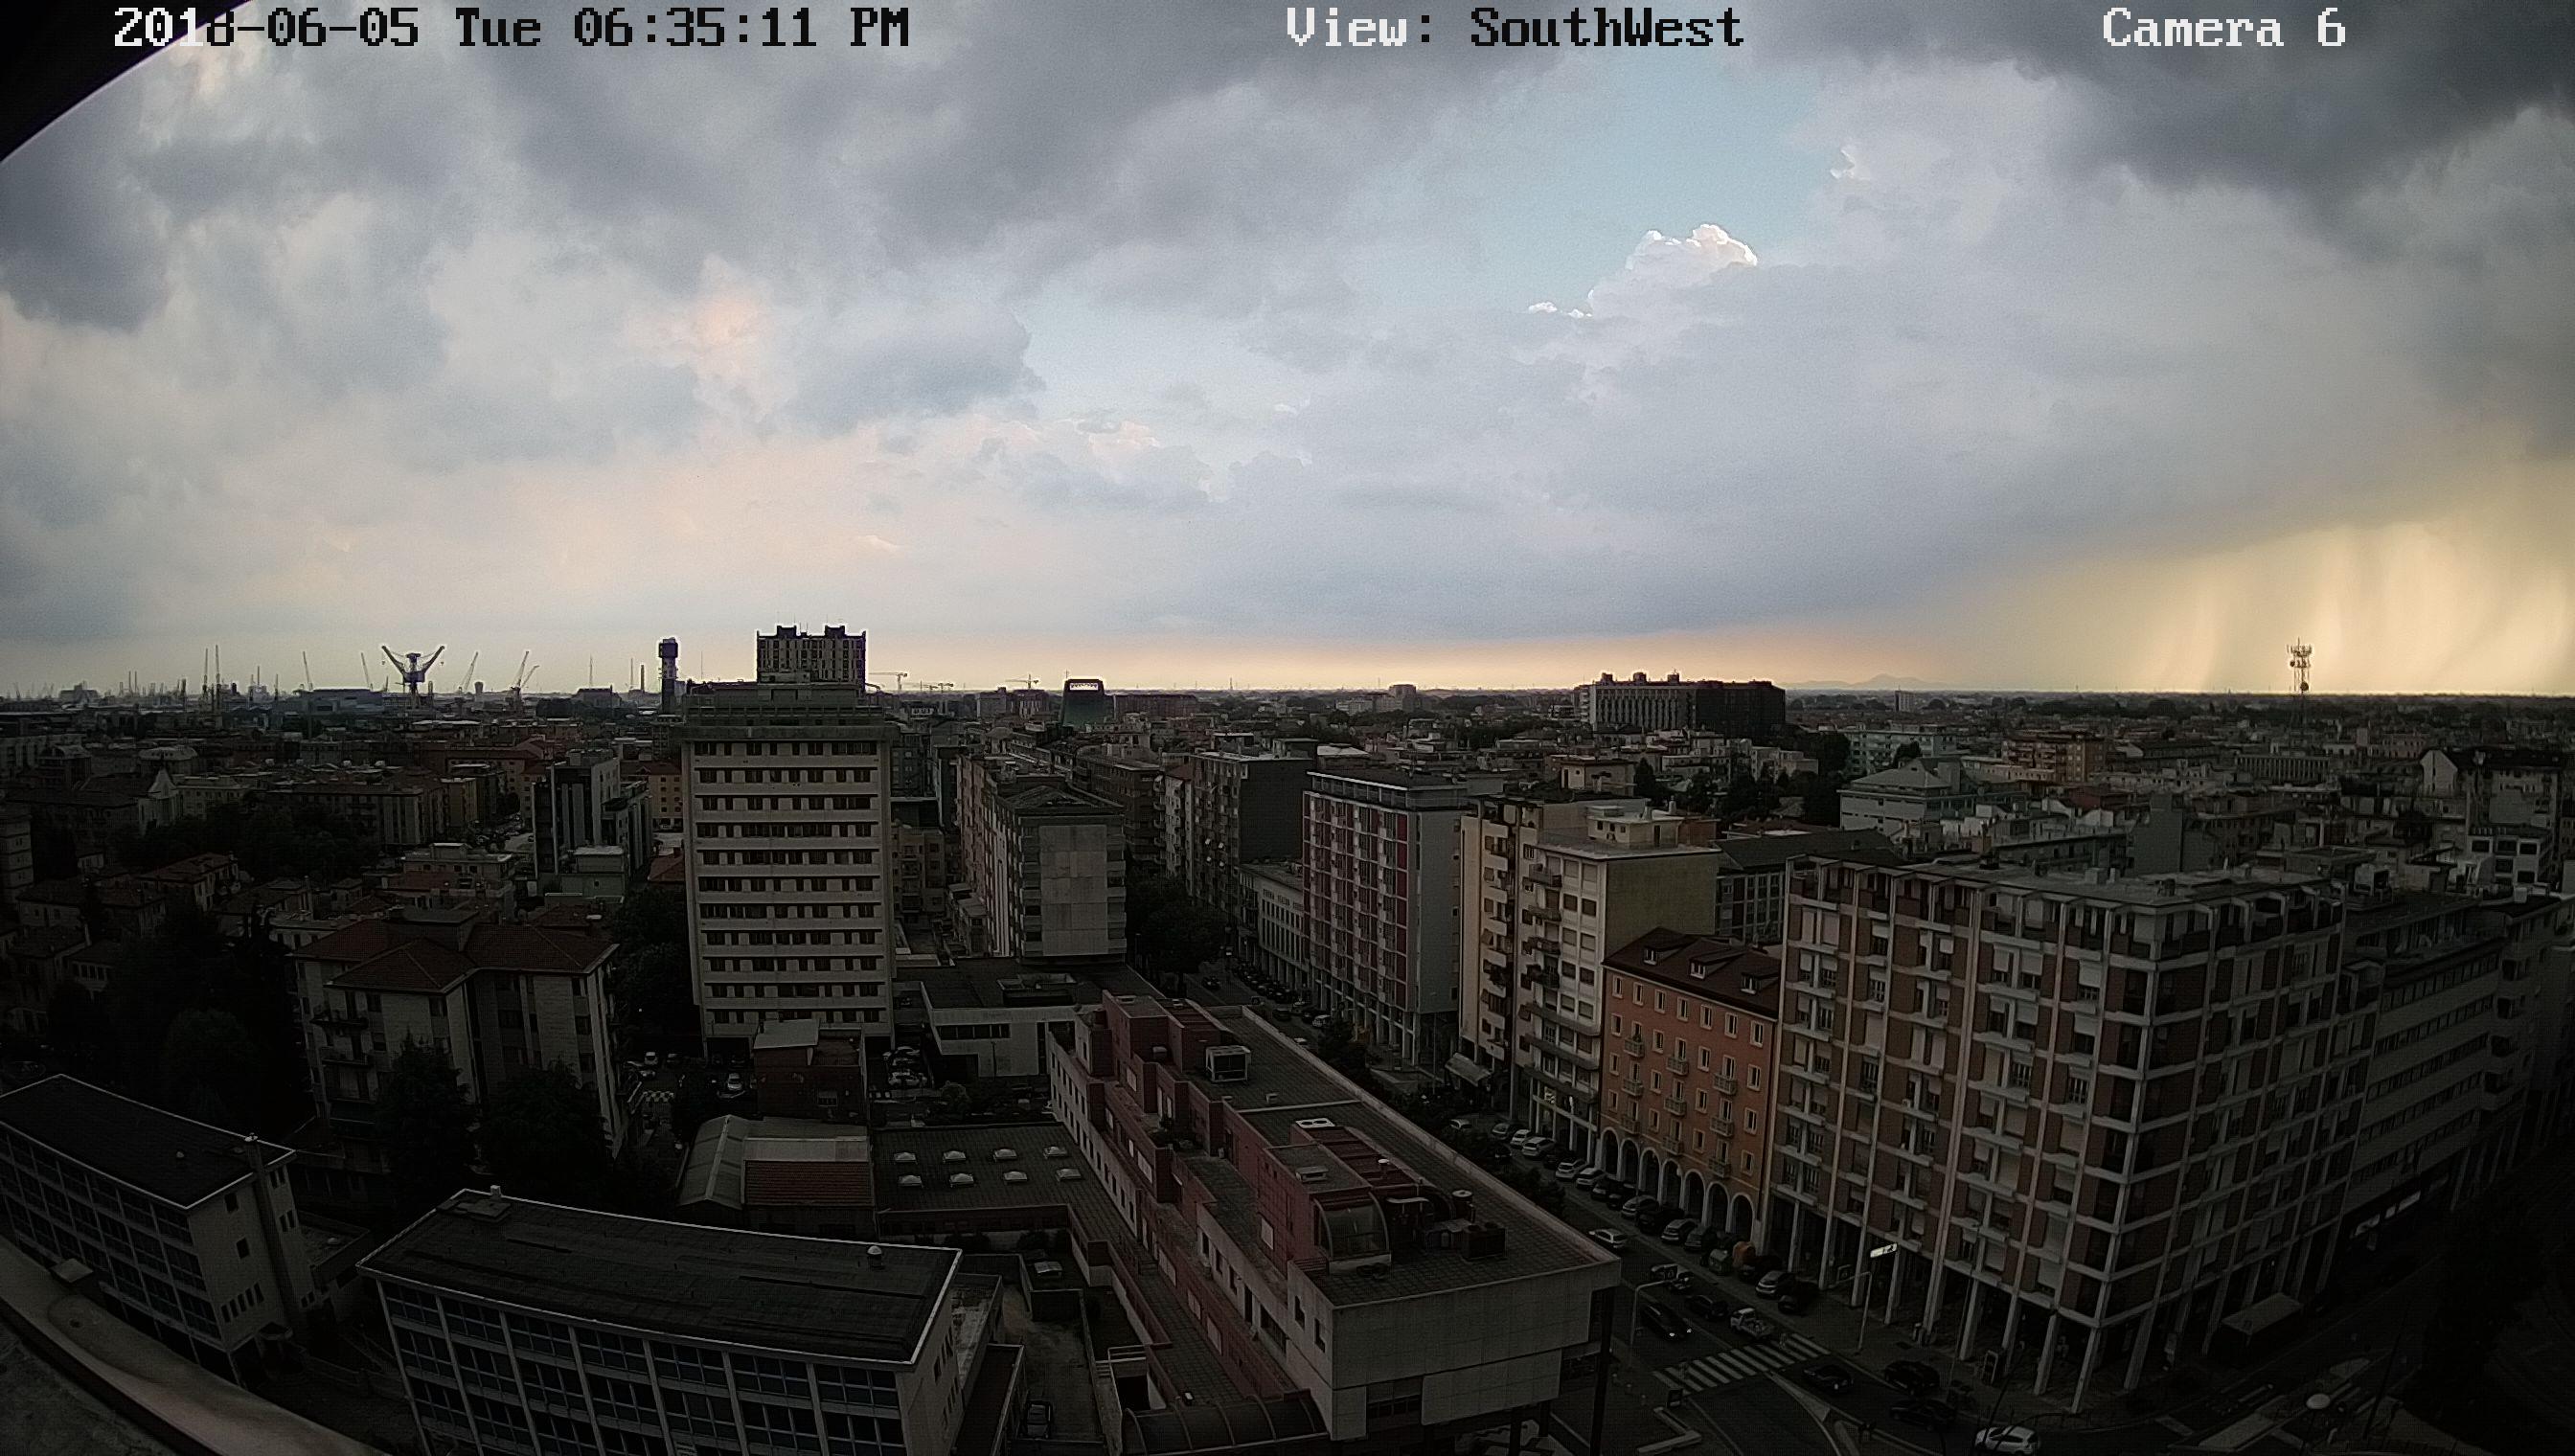 Nowcasting Friuli Venezia Giulia - Veneto Orientale ESTATE 2018-192.168.0.206_01_20180605183510915_timing.jpg